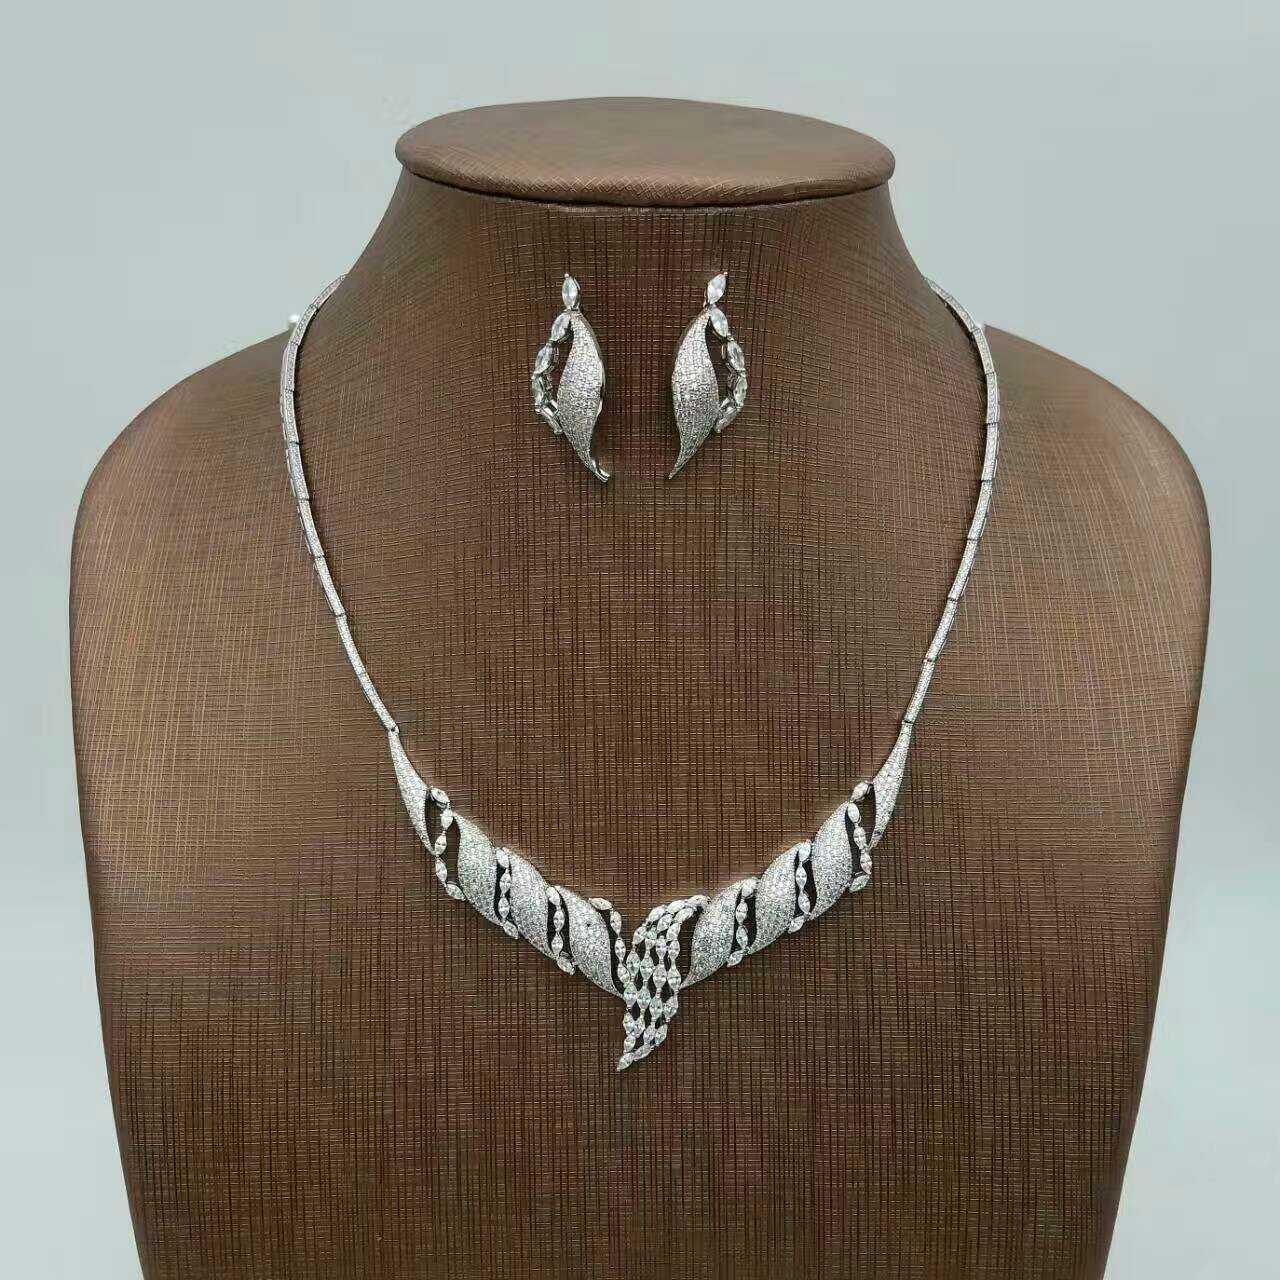 ALW fashion accessories sets necklace earrings ring bracelet set zirconium CZ stone jewelery